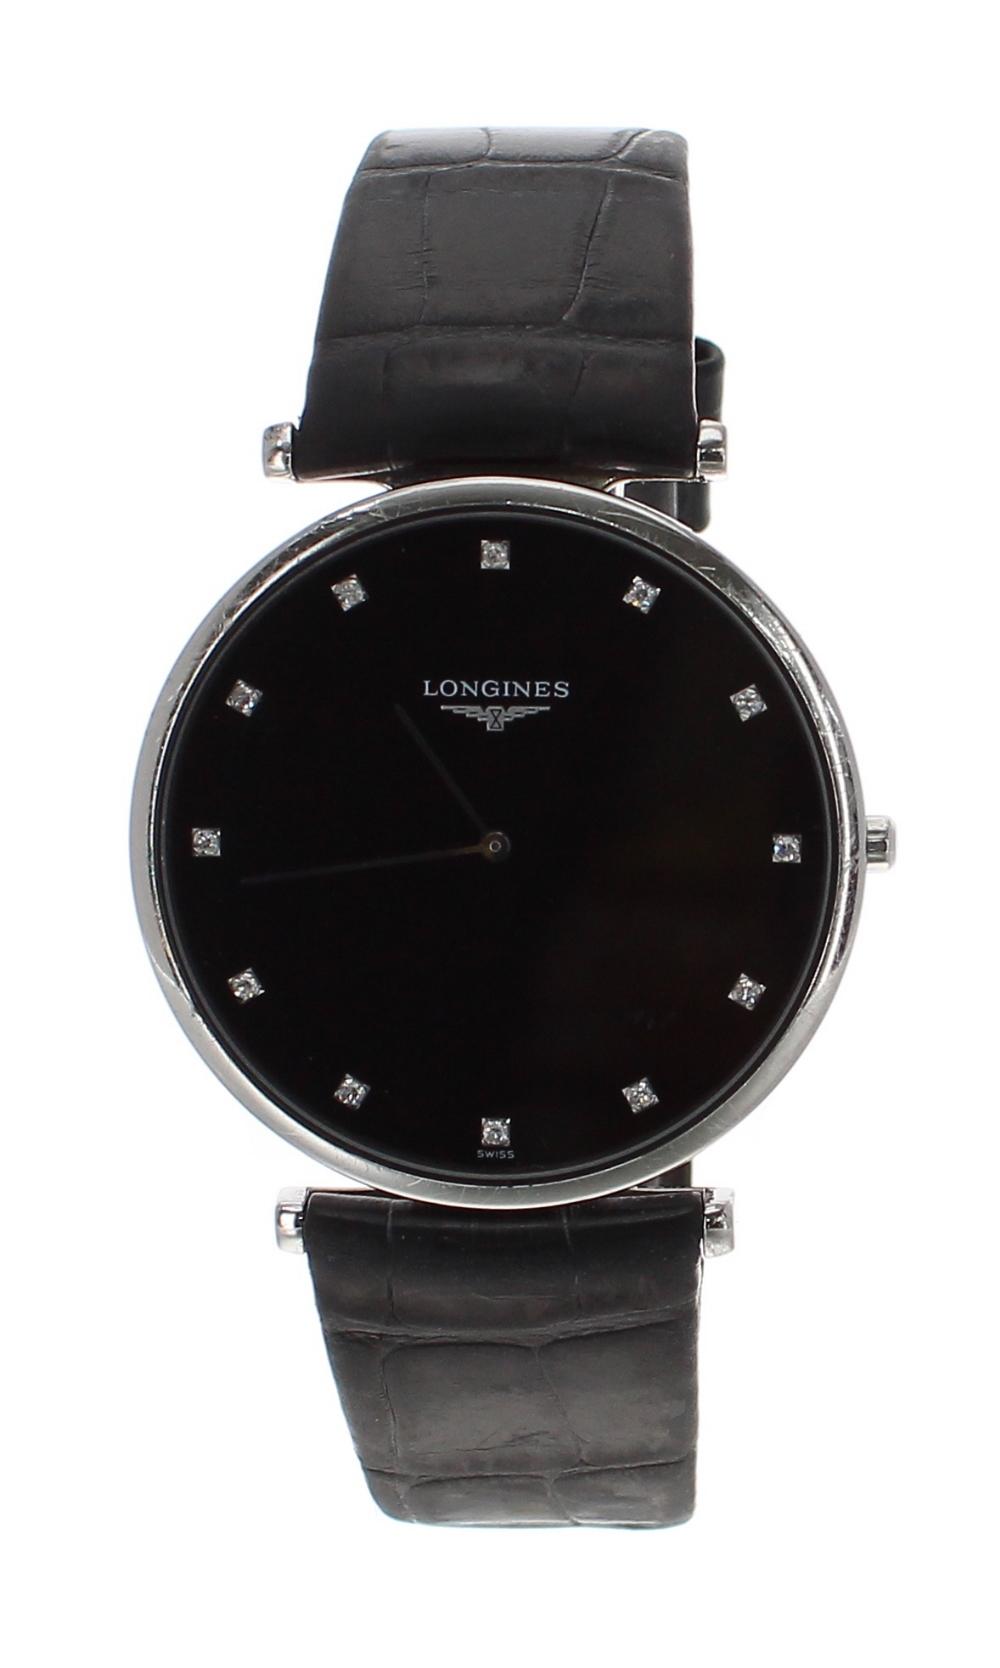 Lot 56 - Longines La Grande Classique stainless steel gentleman's wristwatch, ref. L4 766 4, circular black